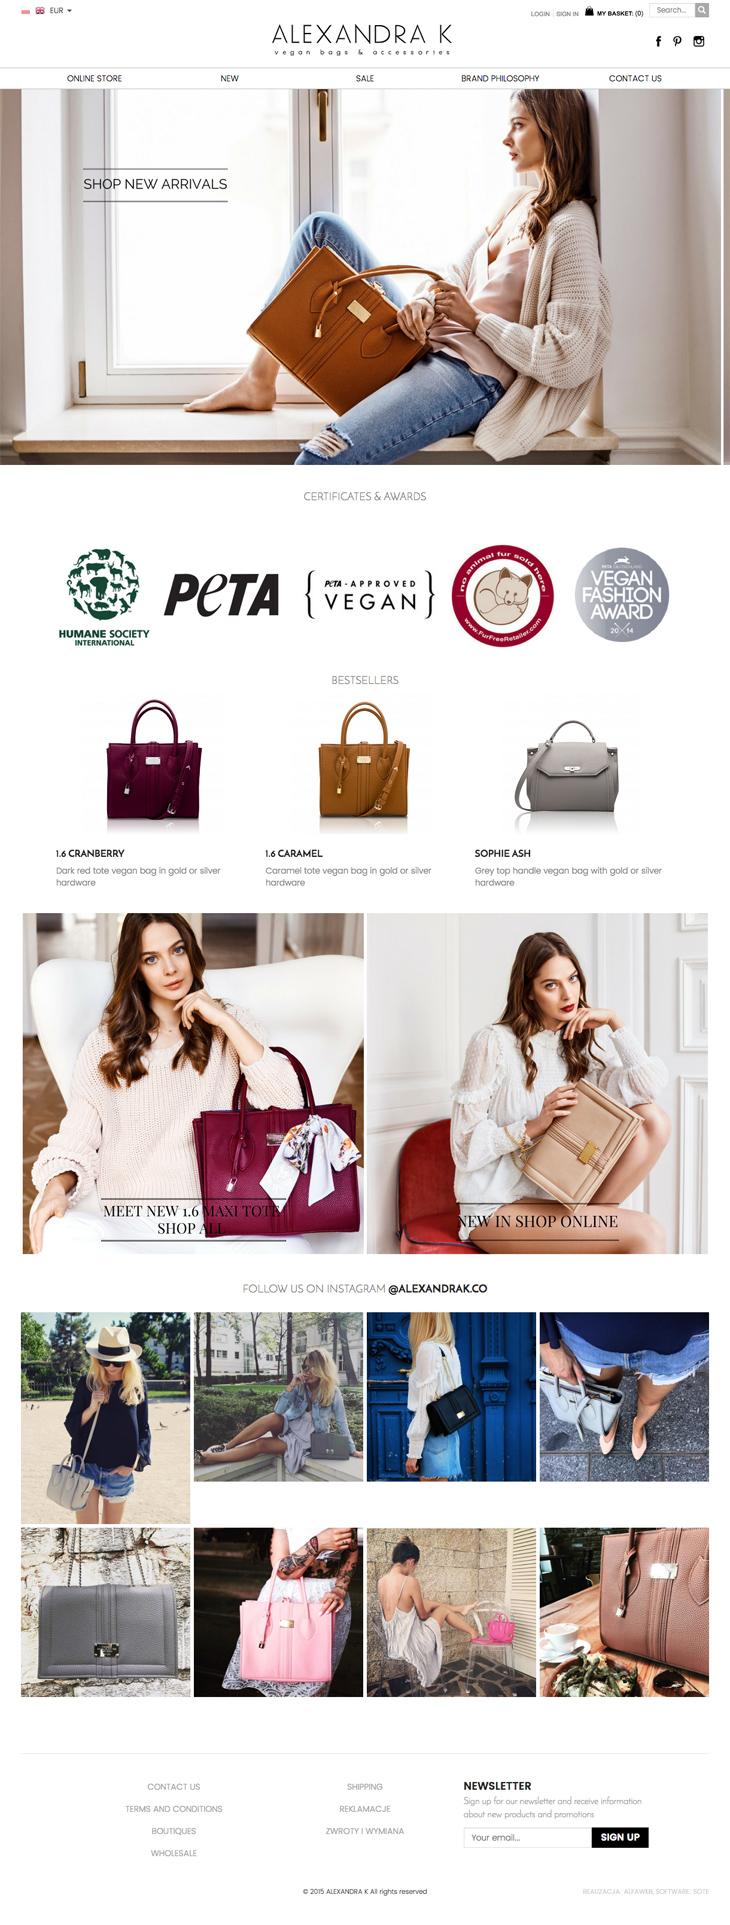 Sklep internetowy ALEXANDRA K vegan bags & accessories